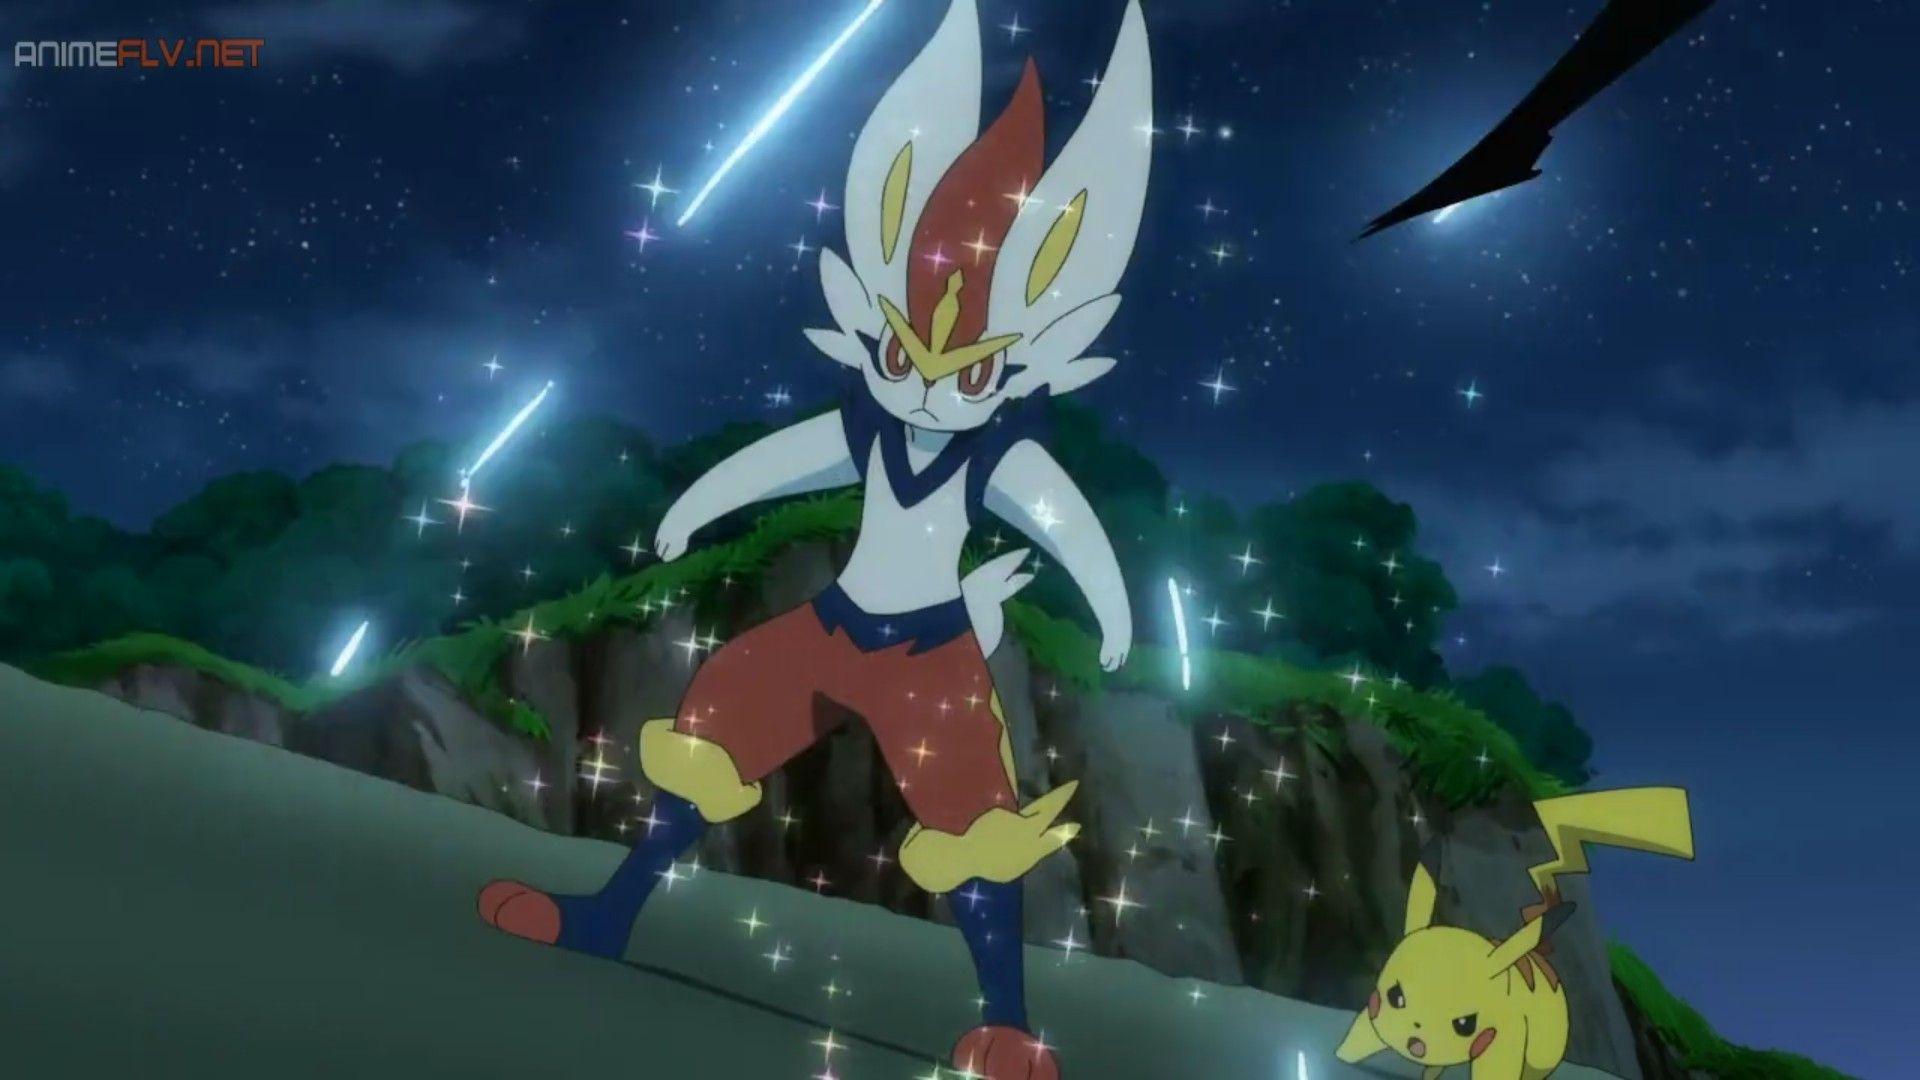 Pin De Santiago En Capturas De Pantalla De Pokemon 2019 En 2021 Pokemon Mochilas Hermosas Captura De Pantalla